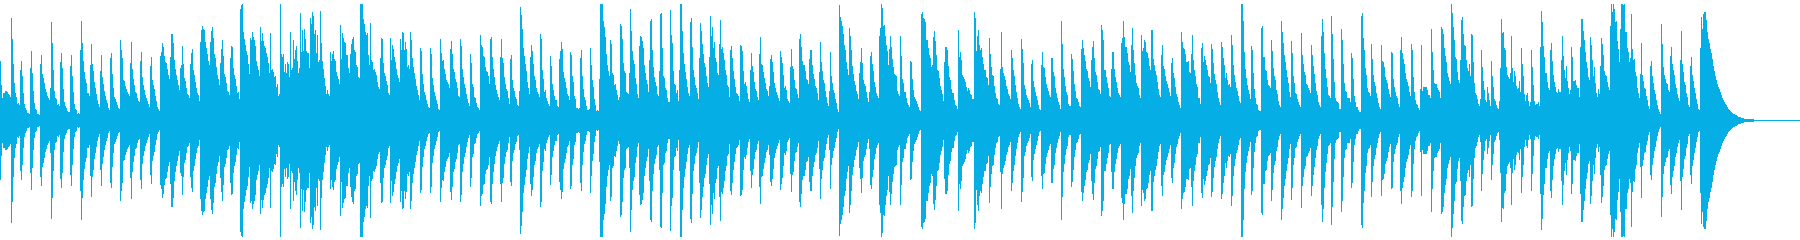 Marimba Cooking 2の再生済みの波形